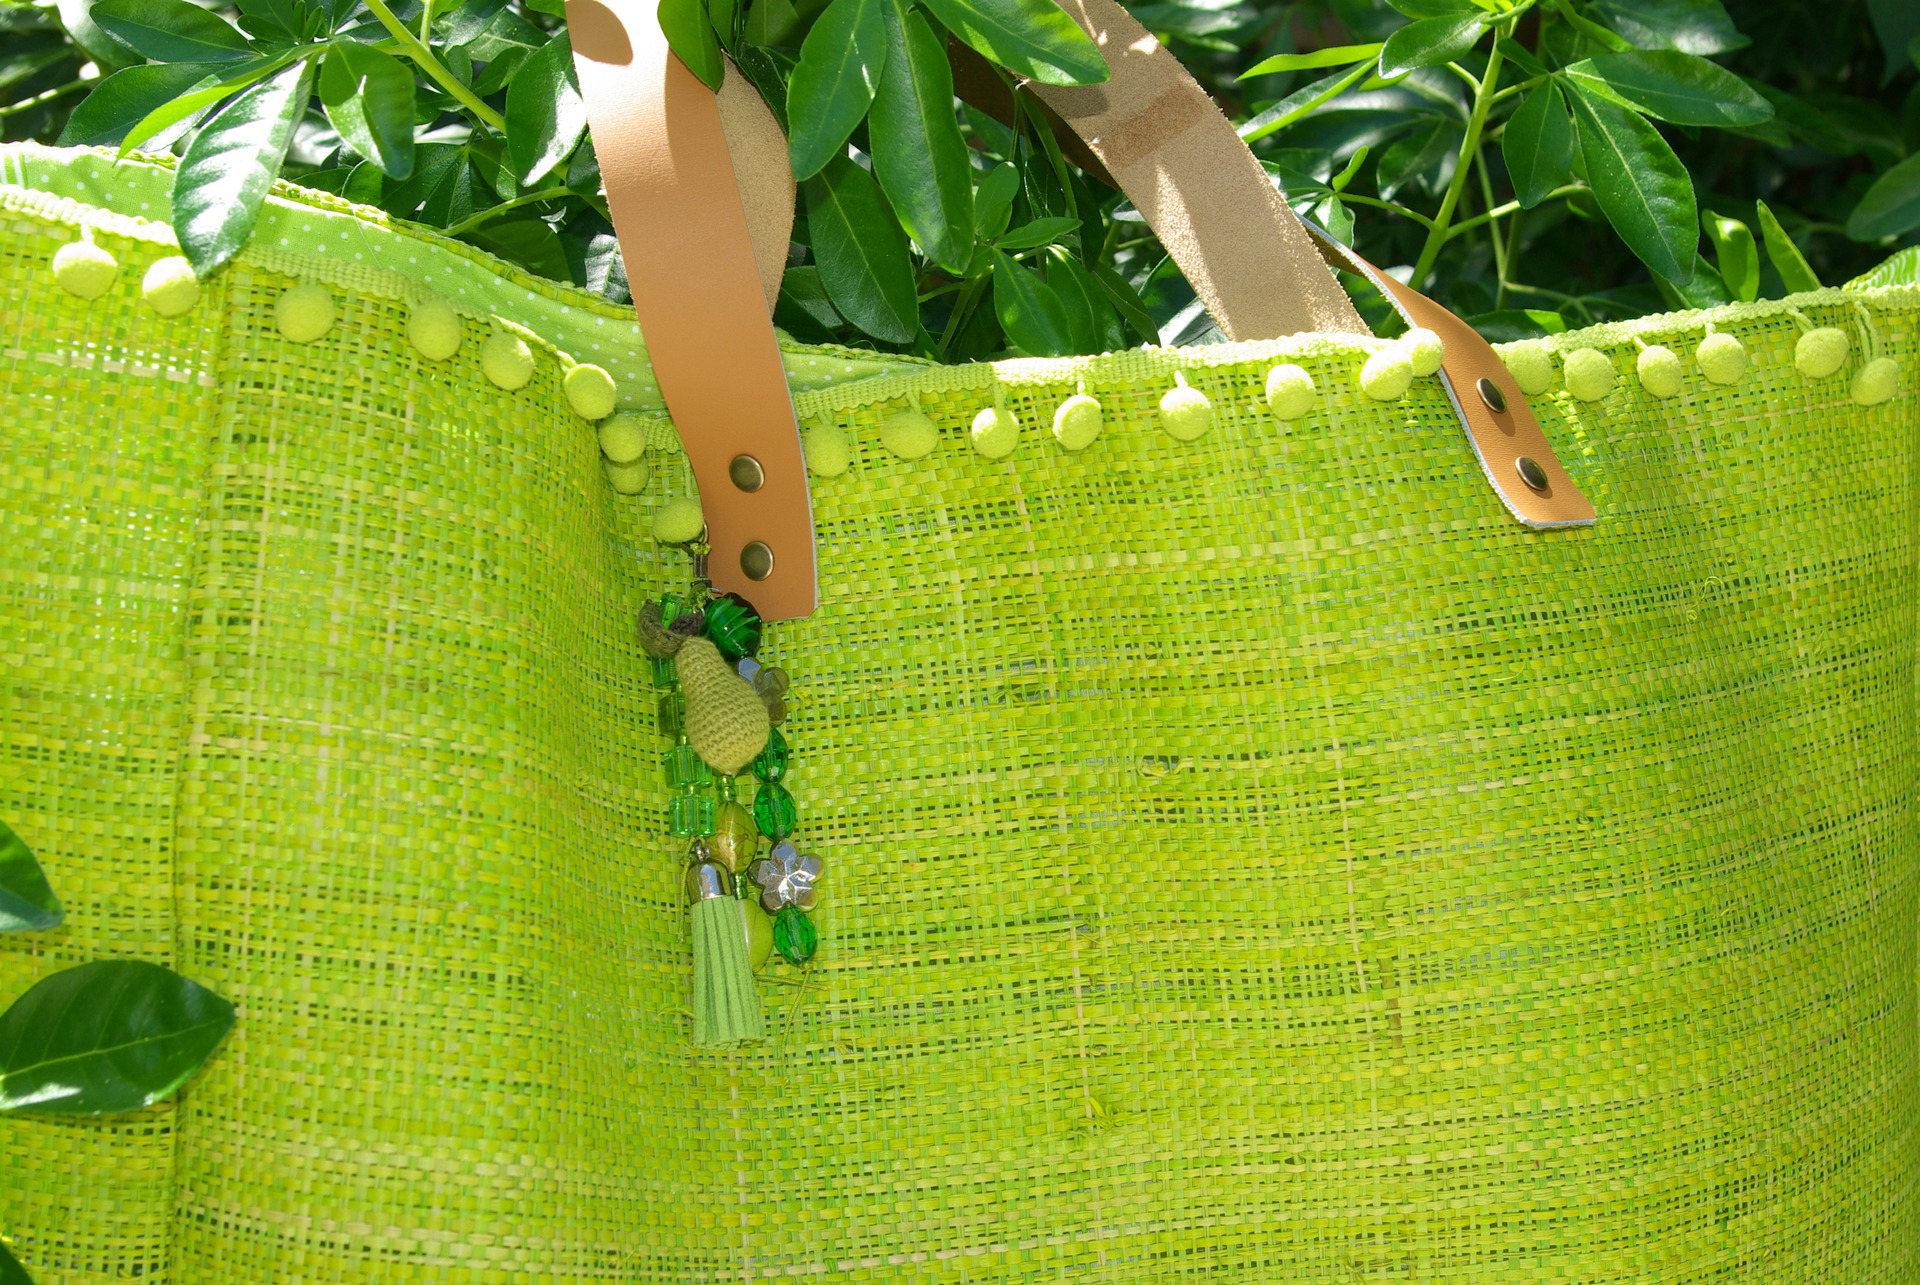 Sac VAÏANA rabane naturelle verte